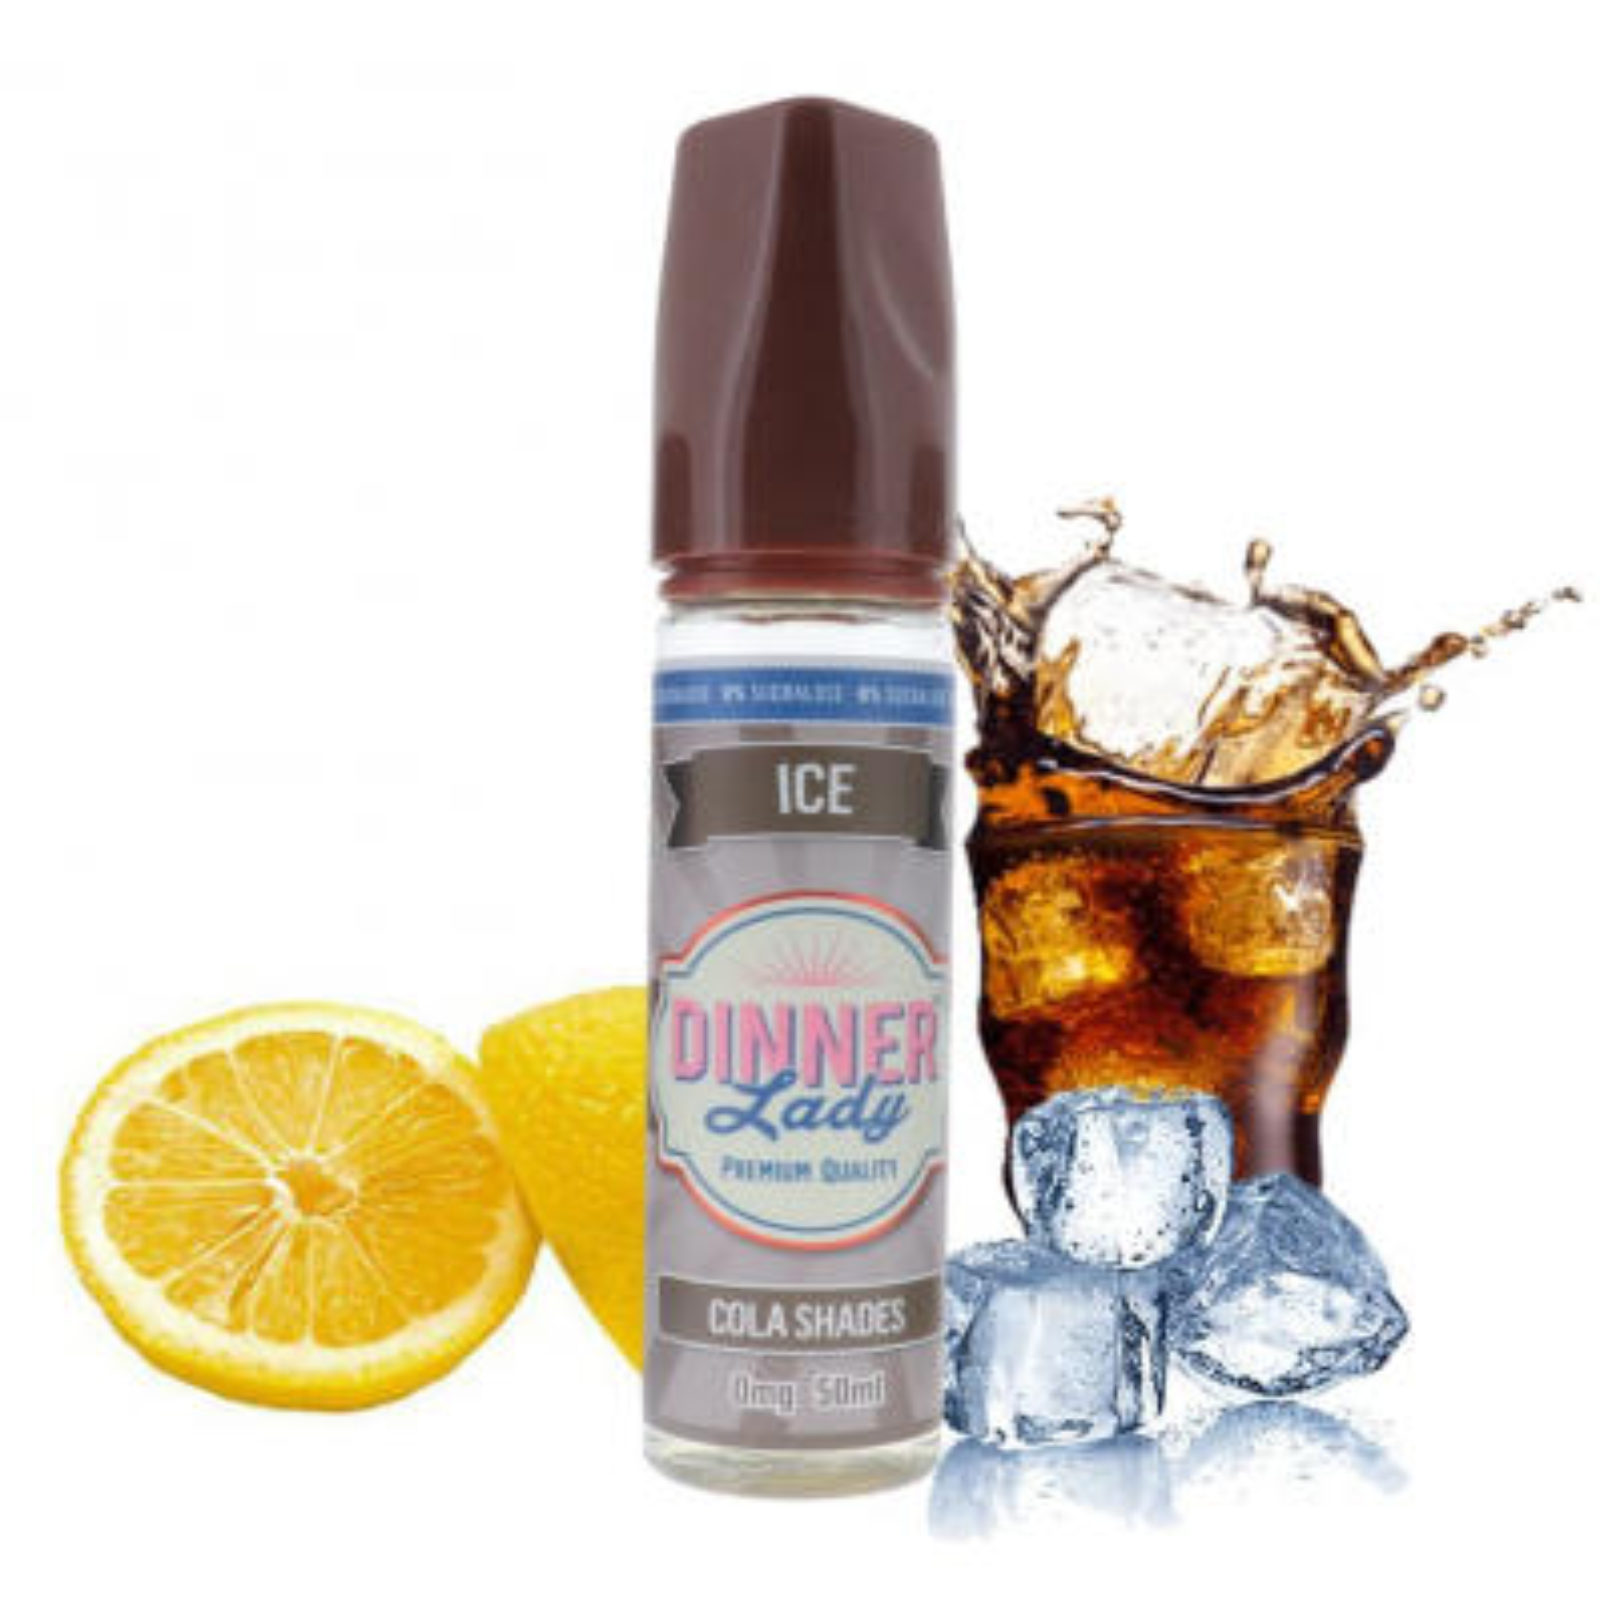 Cola Shades Ice 0% sucralose 50ml - Dinner Lady